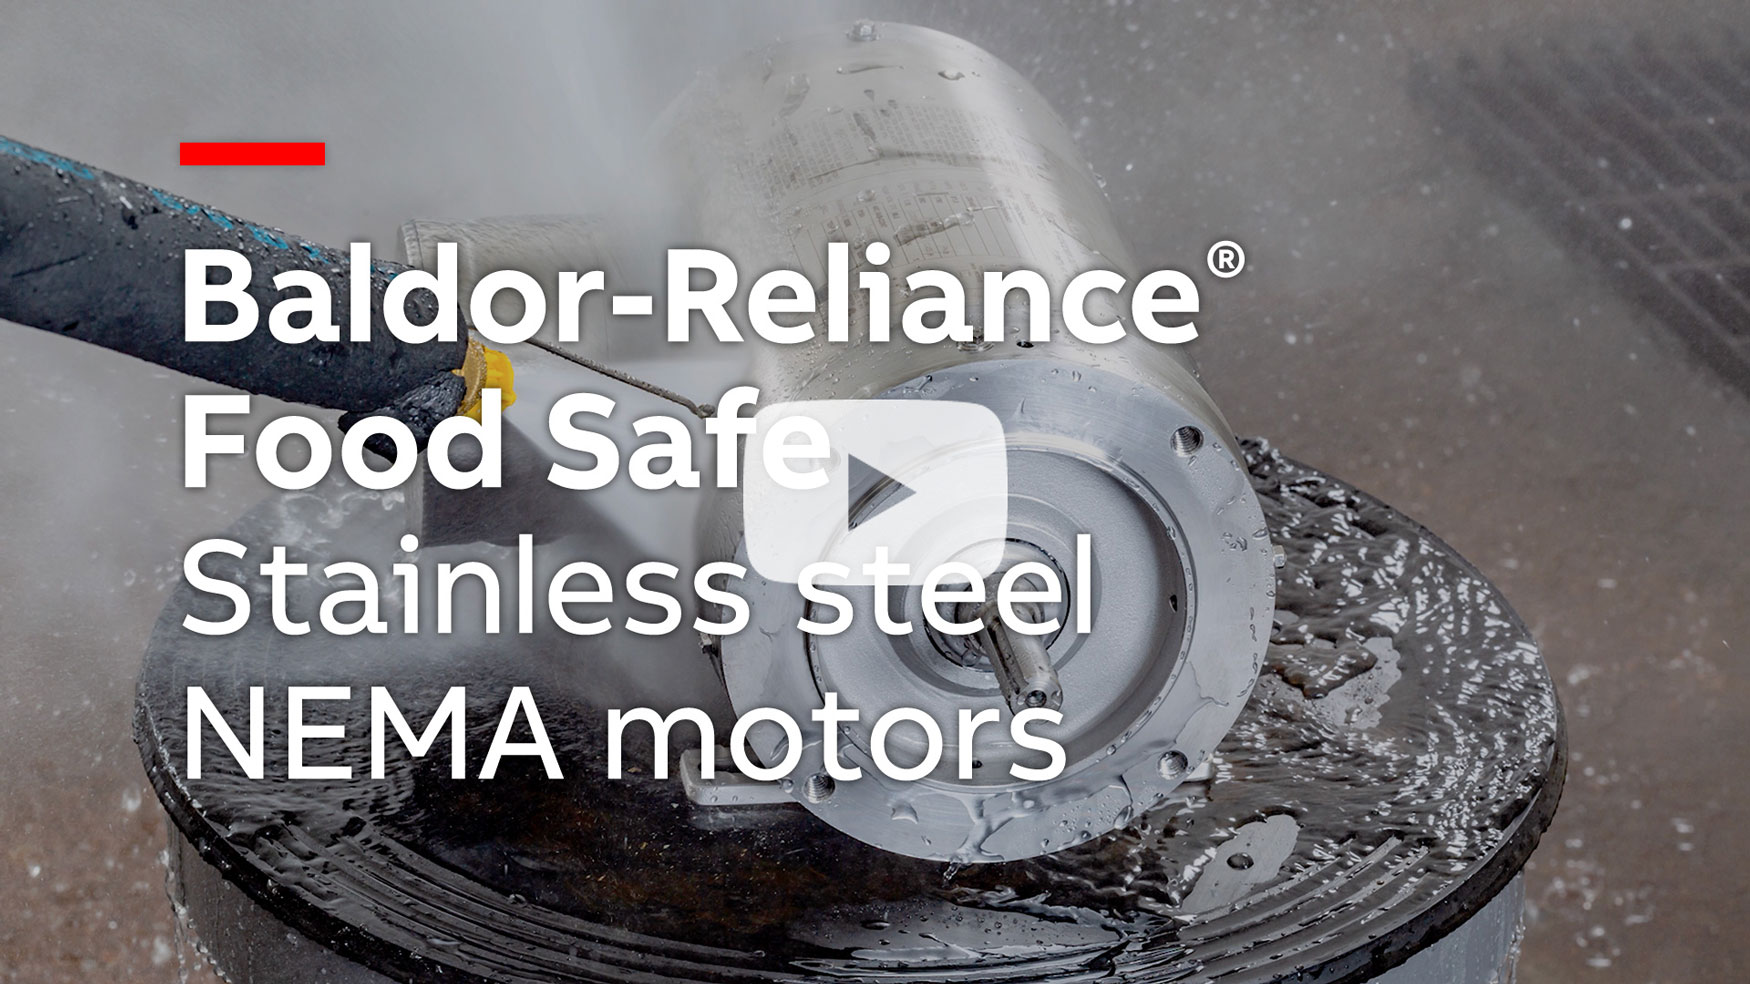 medium resolution of baldor reliance food safe stainless steel nema motors watch video